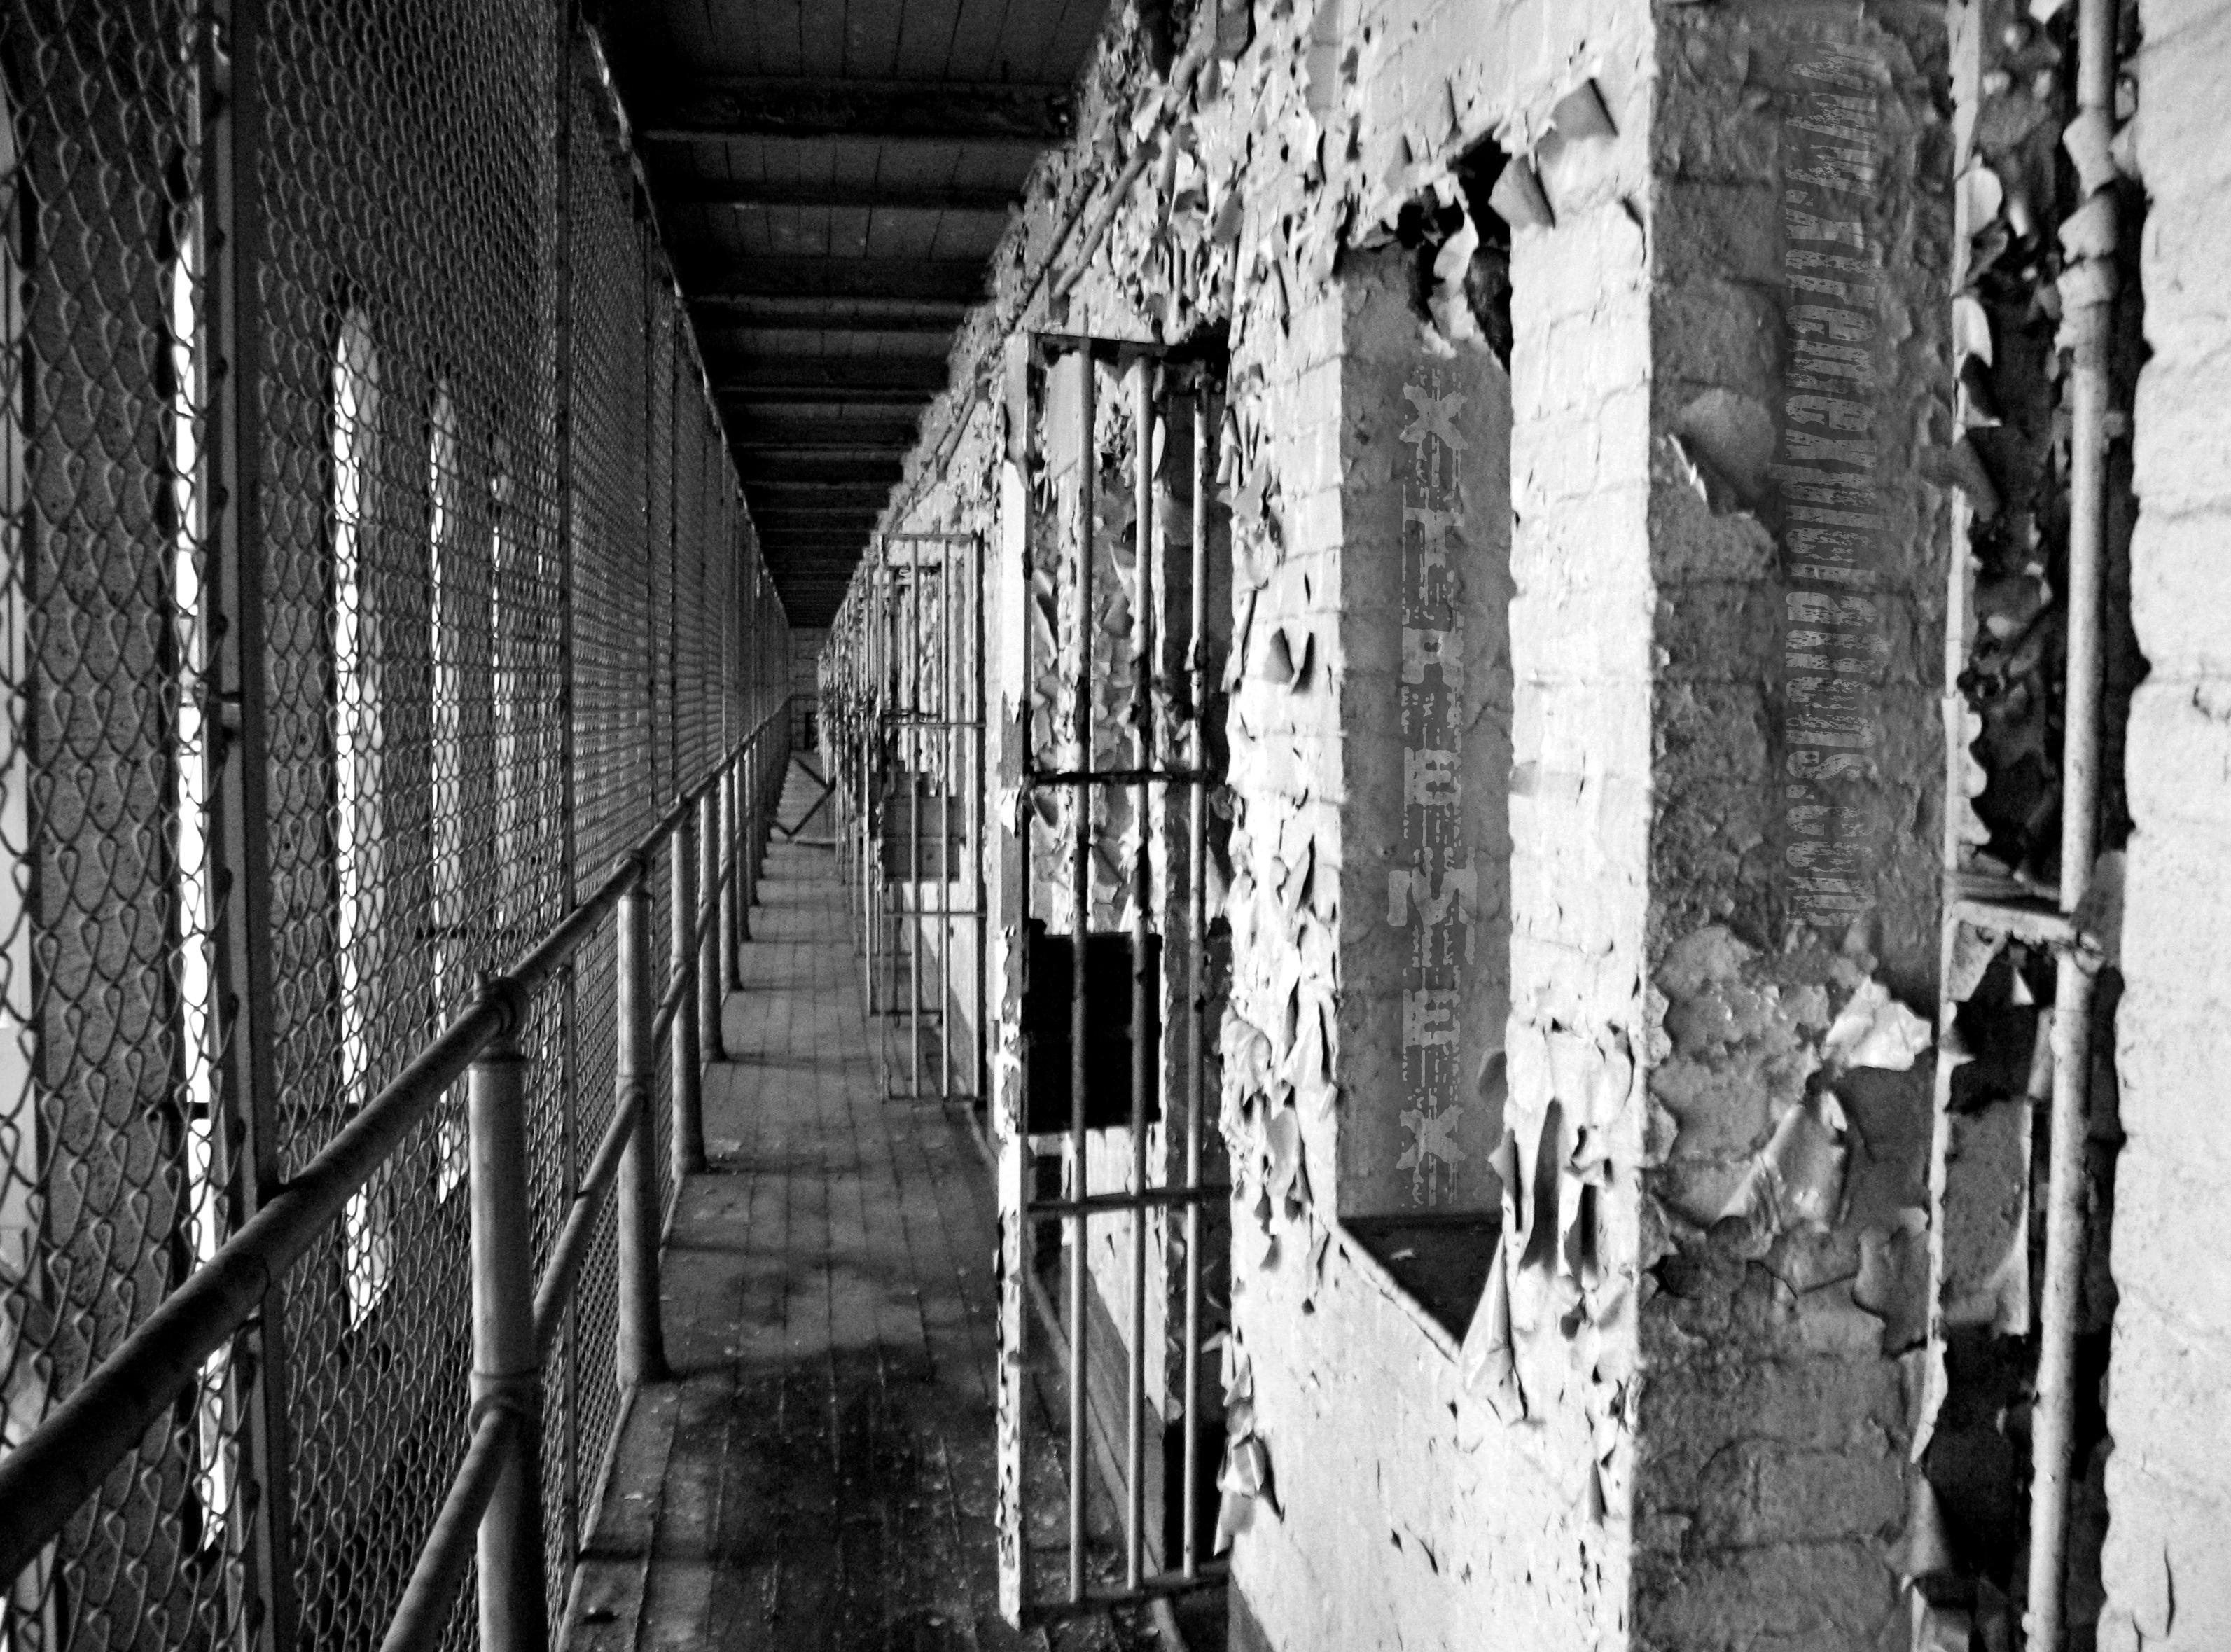 Prison Wall Wallpaper Wallpapers 3186x2359